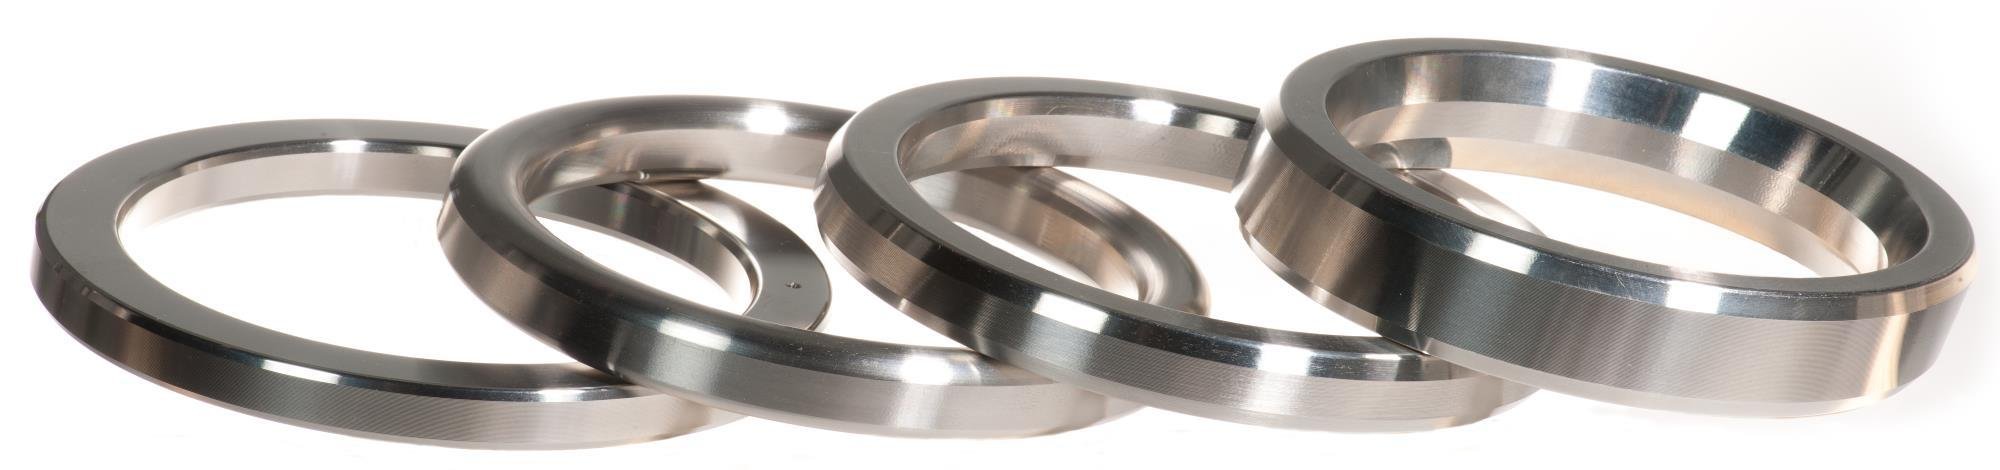 Seal Innovations Oring Sil 110 Rtj Sliderdim2000x470x50x50x2000x470